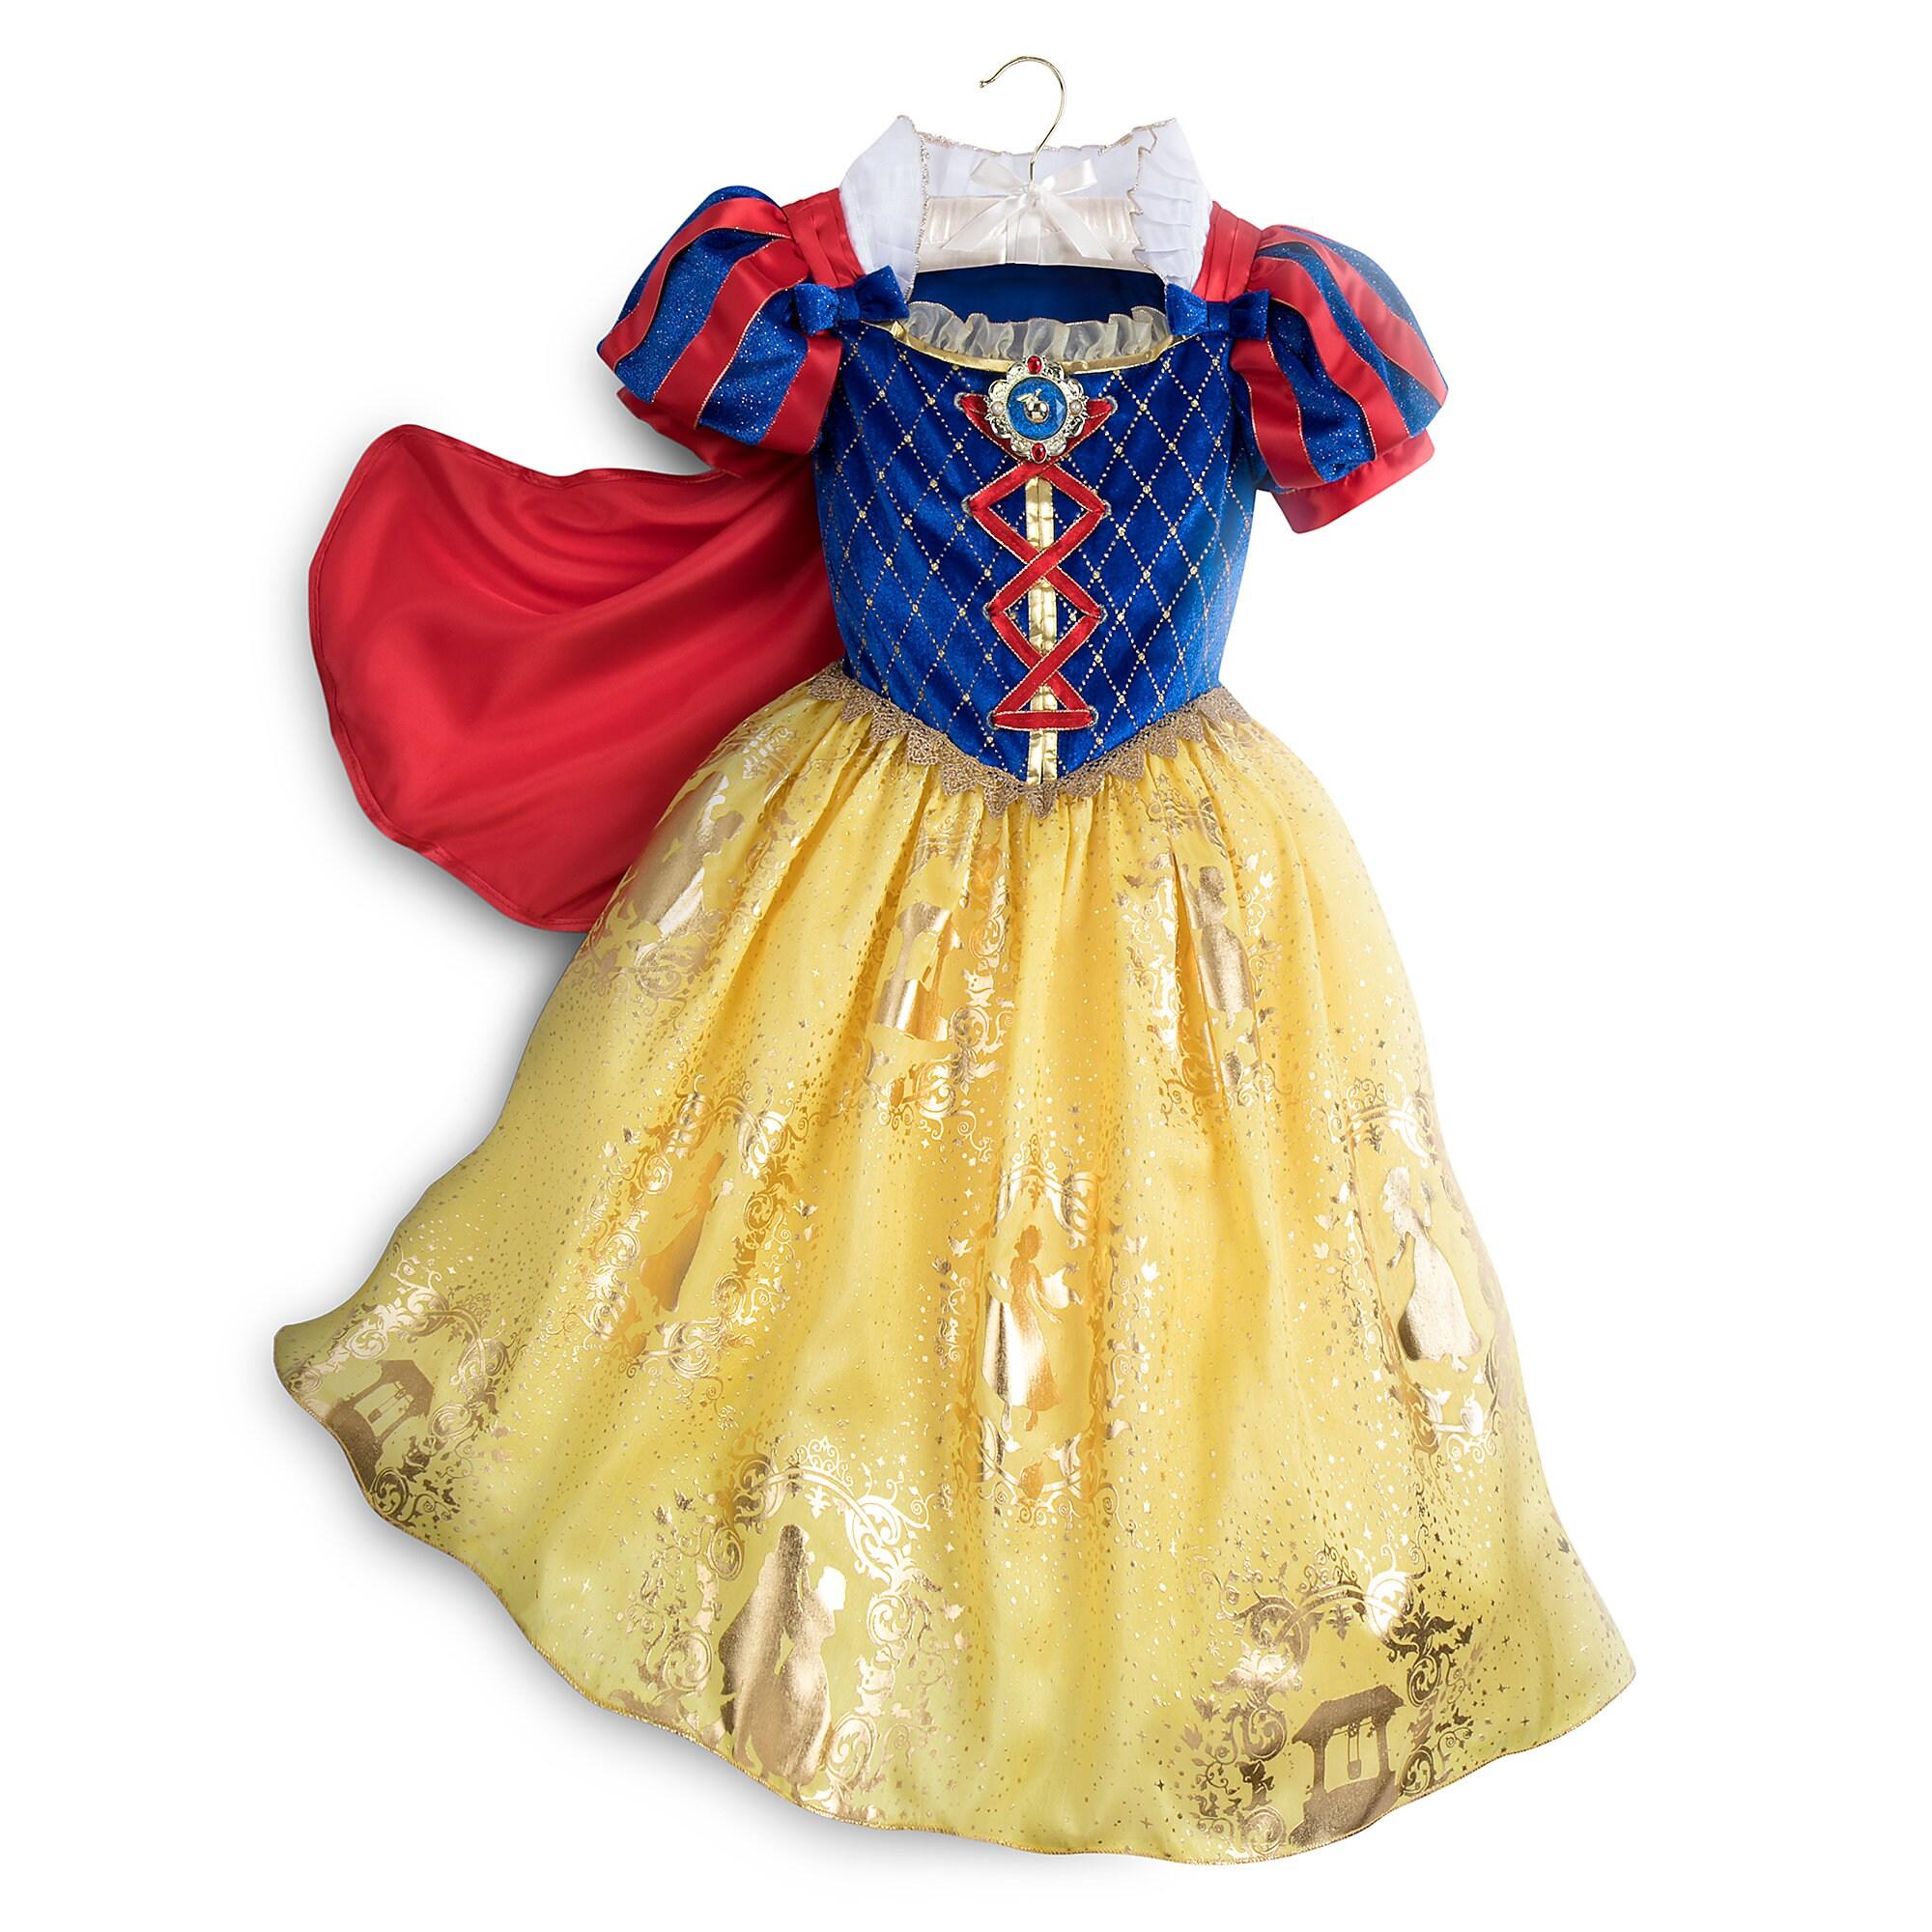 Snow white dress images